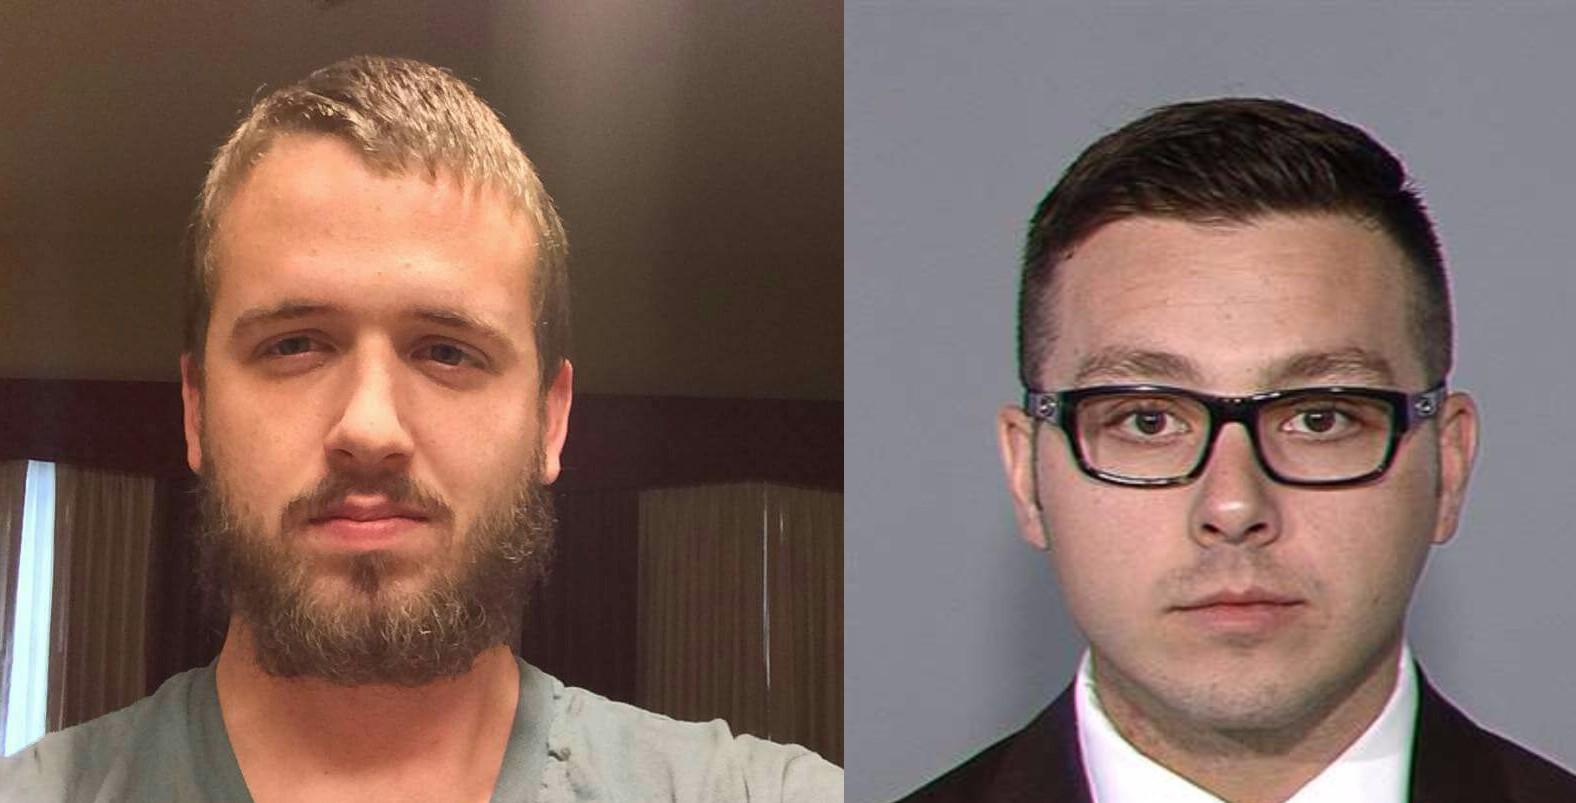 Daniel Shaver, left, and ex-Officer Philip Brailsford.